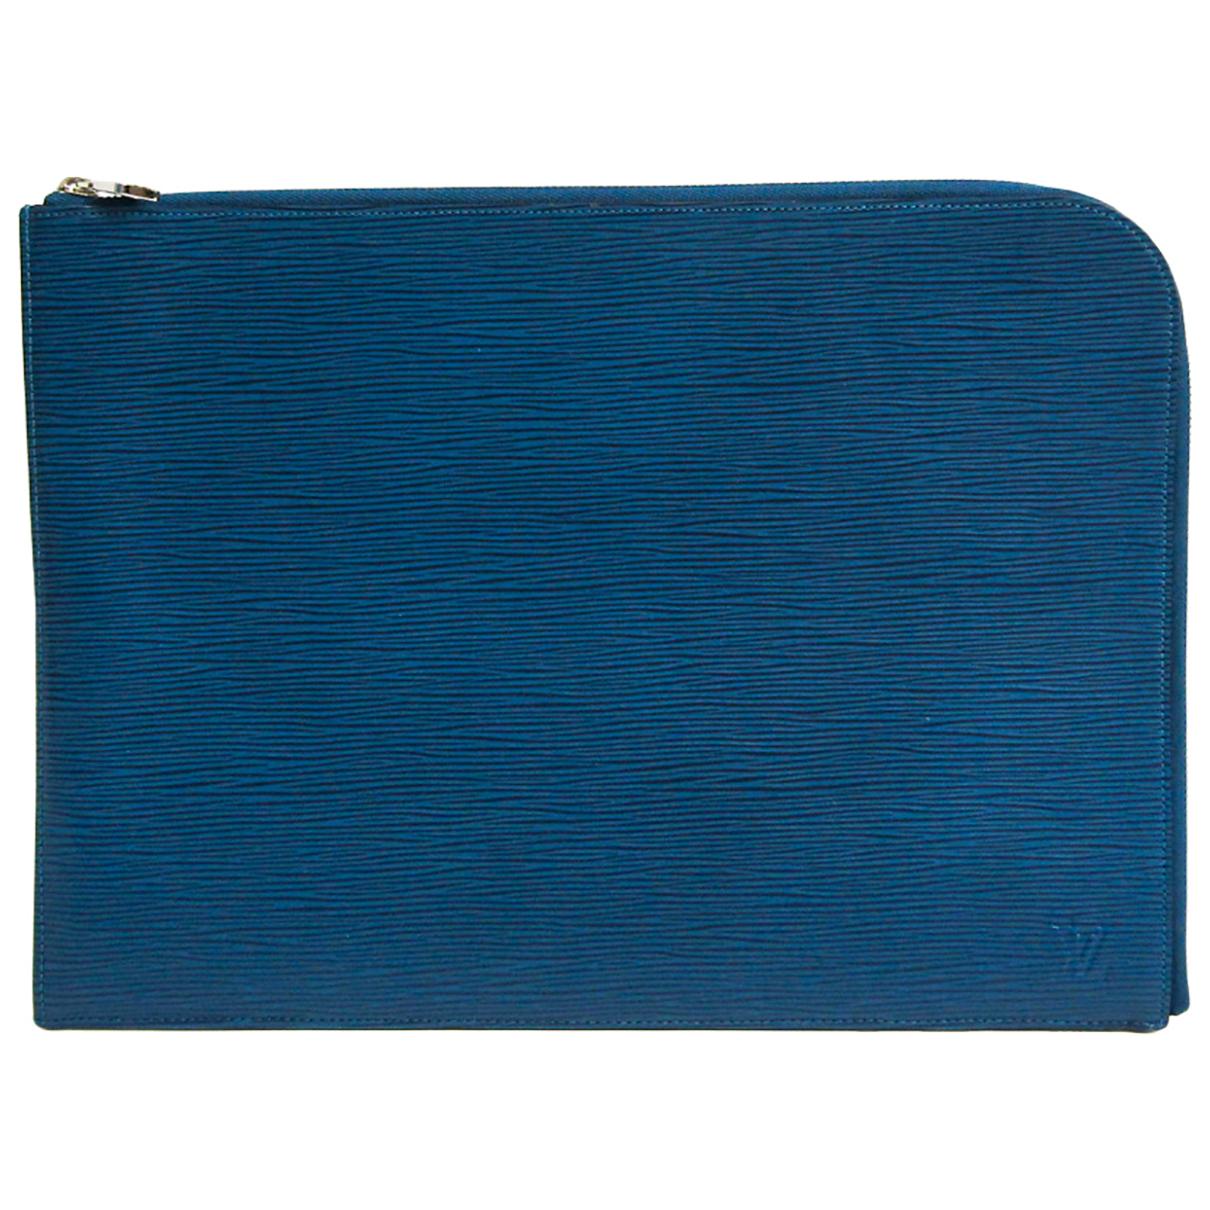 Louis Vuitton N Blue Leather bag for Men N